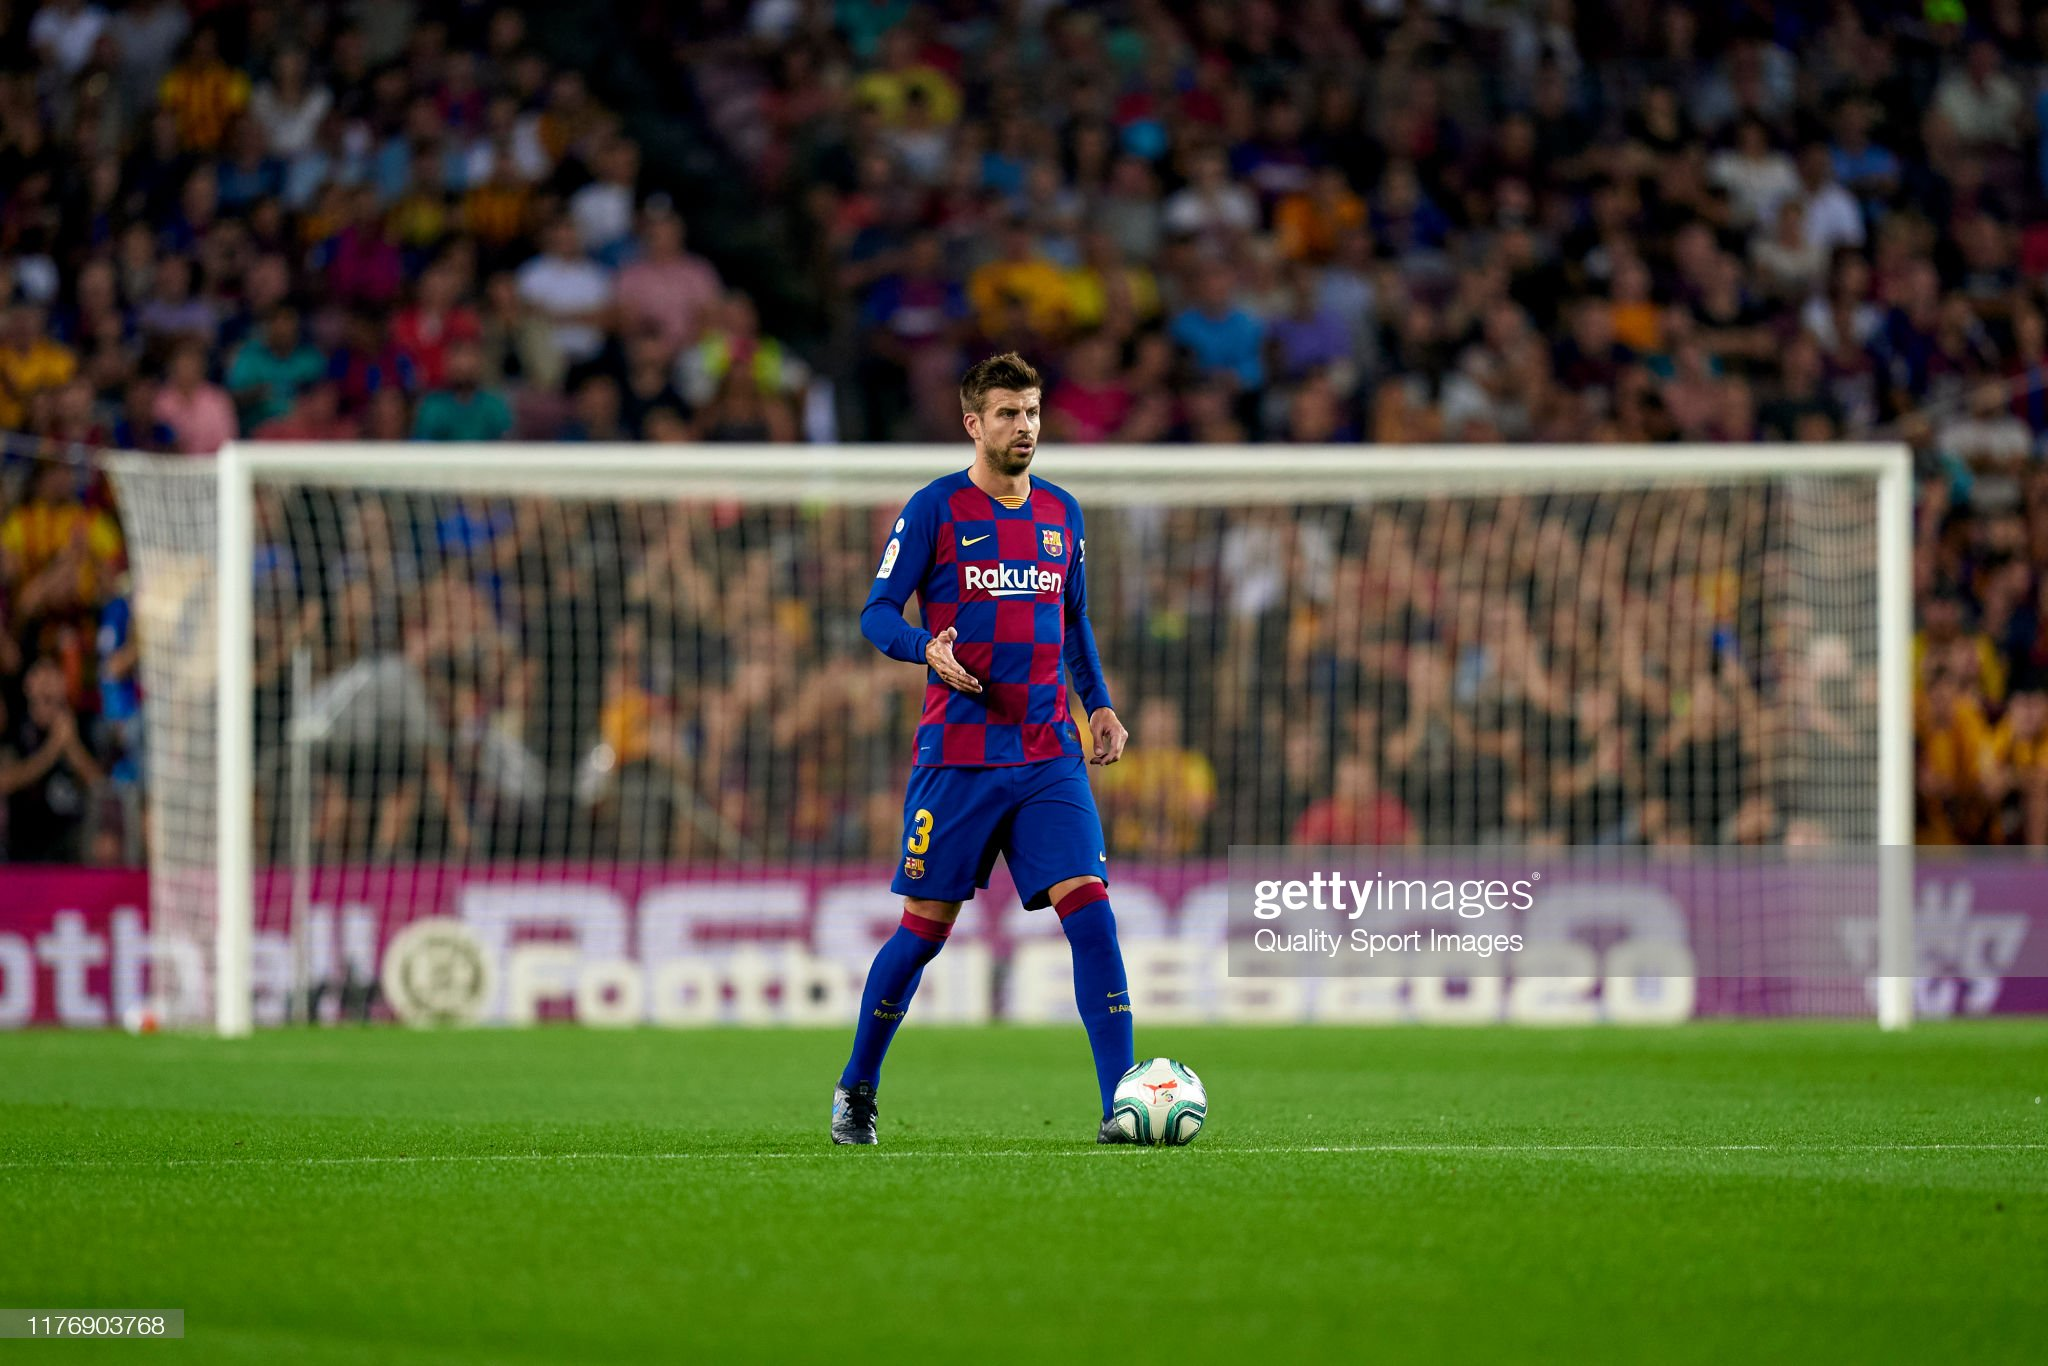 صور مباراة : برشلونة - فياريال 2-1 ( 24-09-2019 )  Gerard-pique-of-fc-barcelona-with-the-ball-during-the-liga-match-fc-picture-id1176903768?s=2048x2048